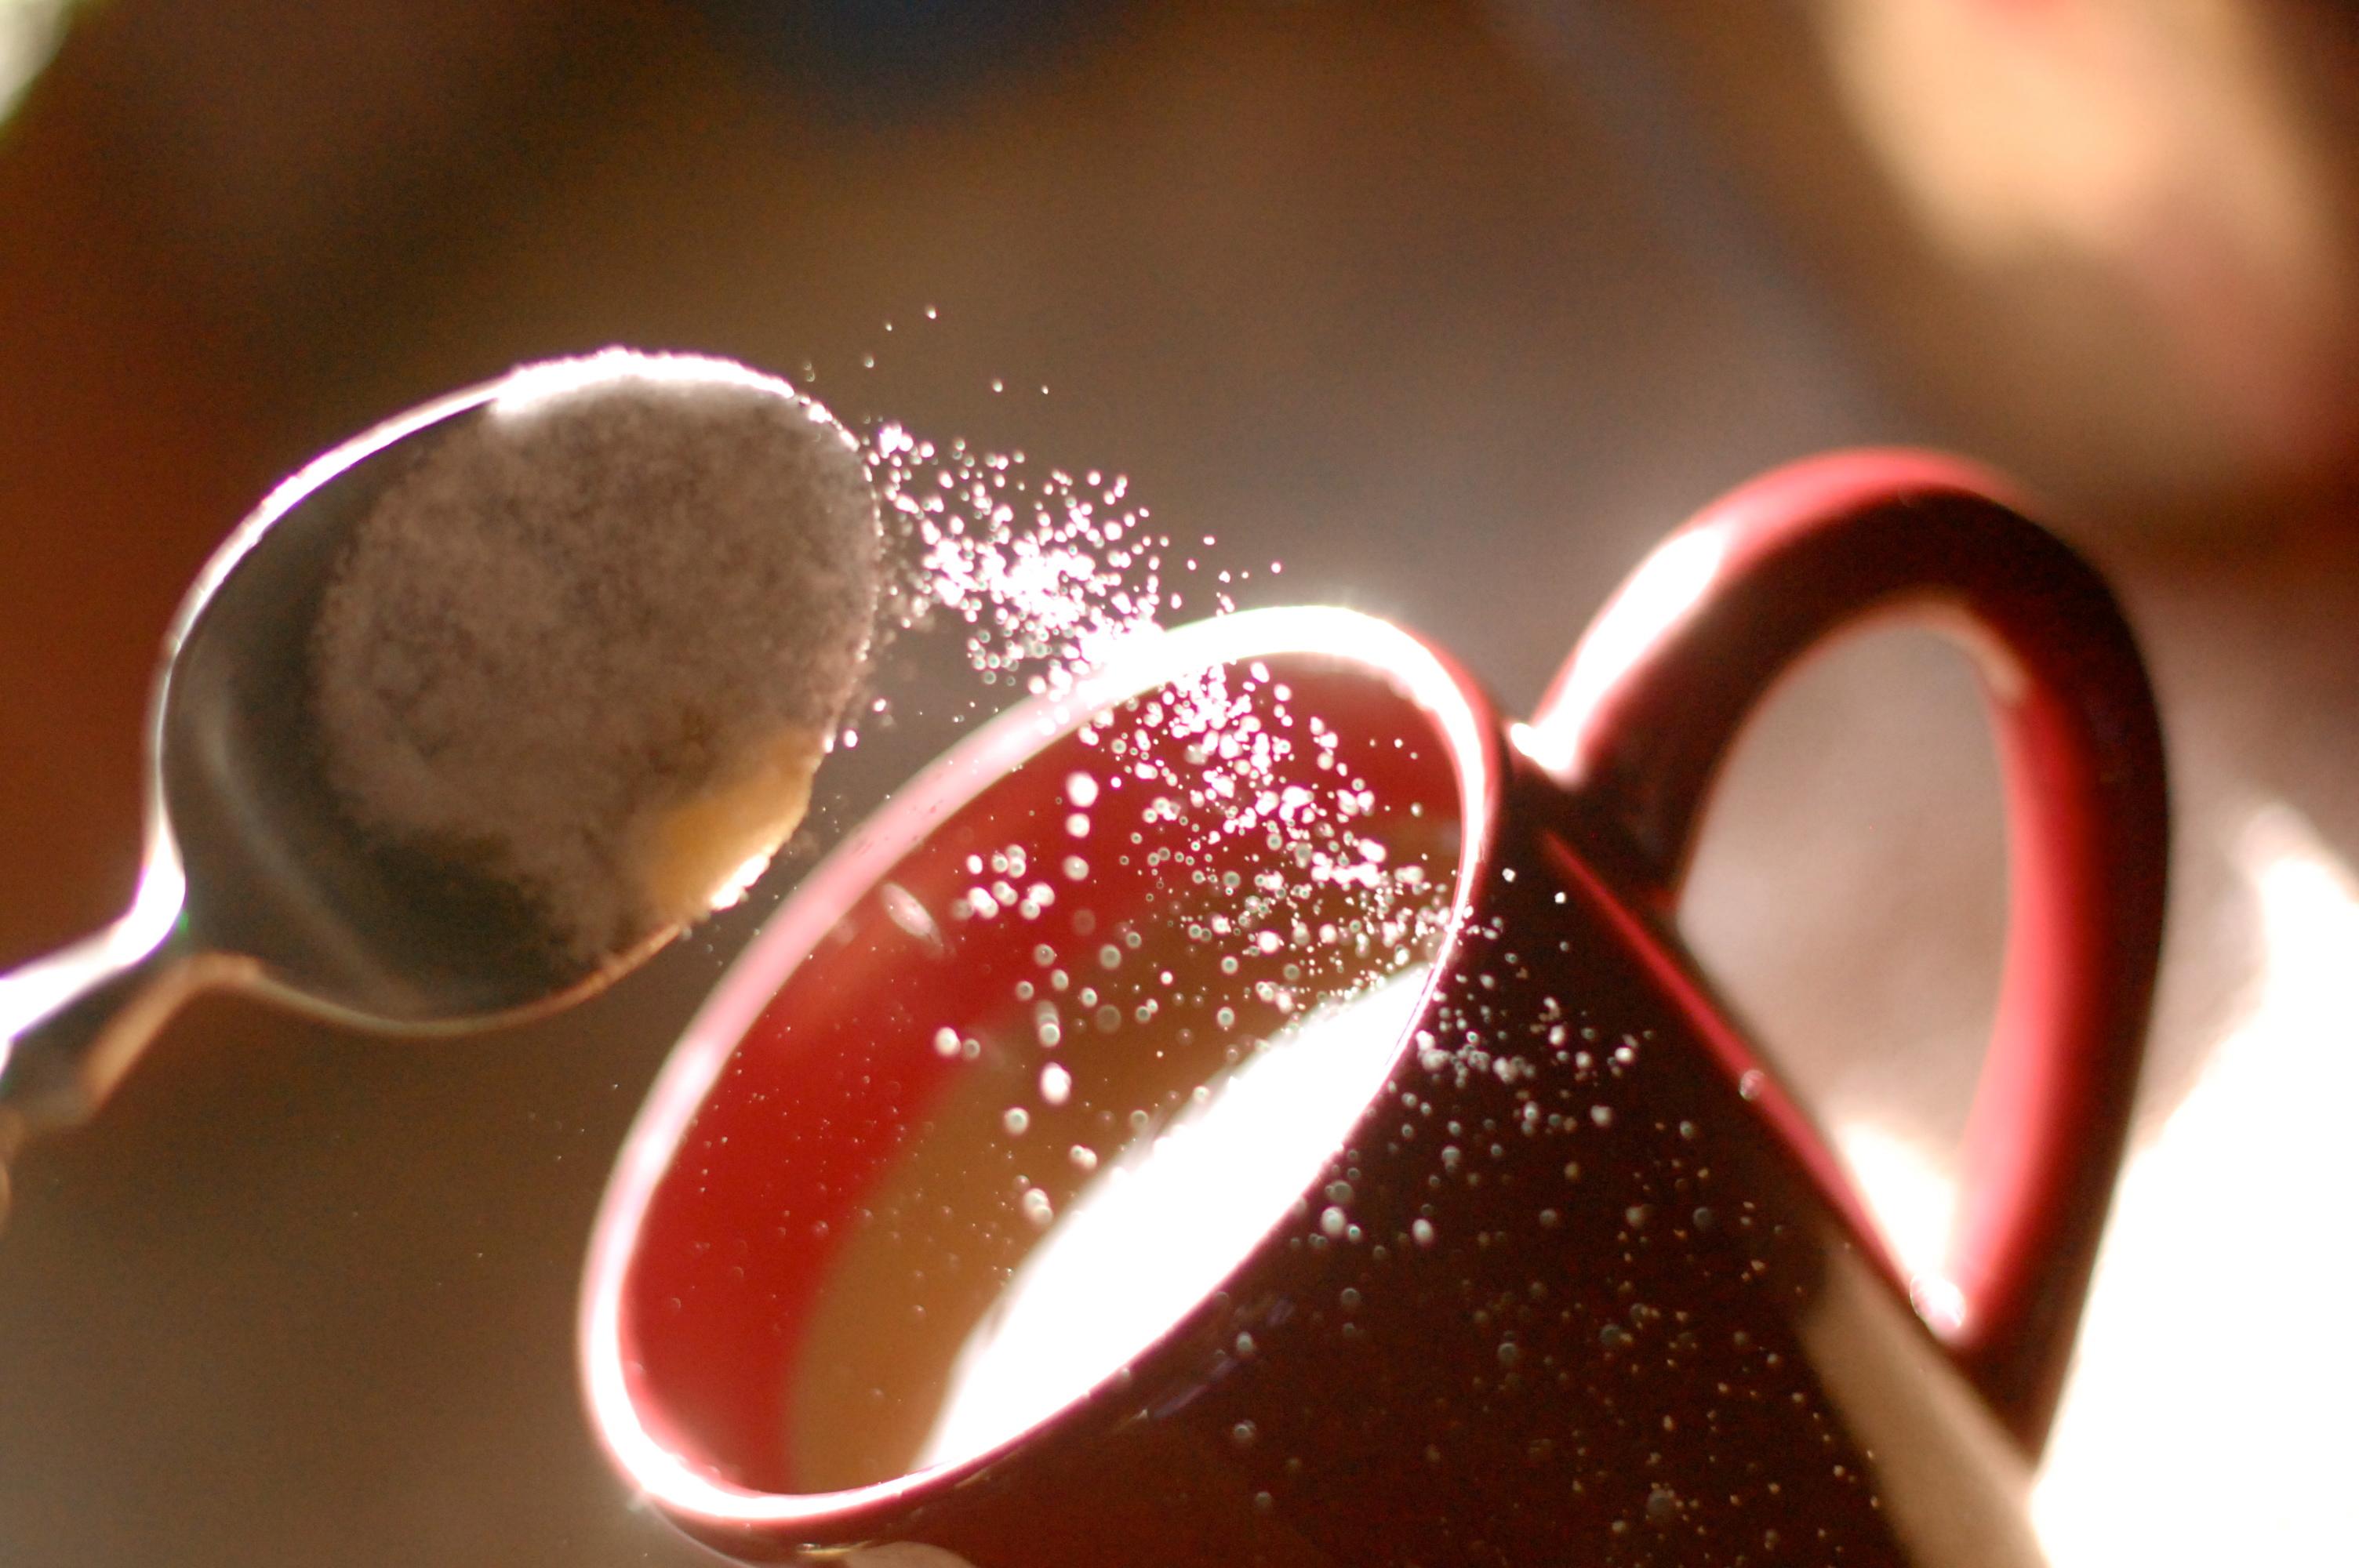 одно картинки чашек с сахаром пойдёт